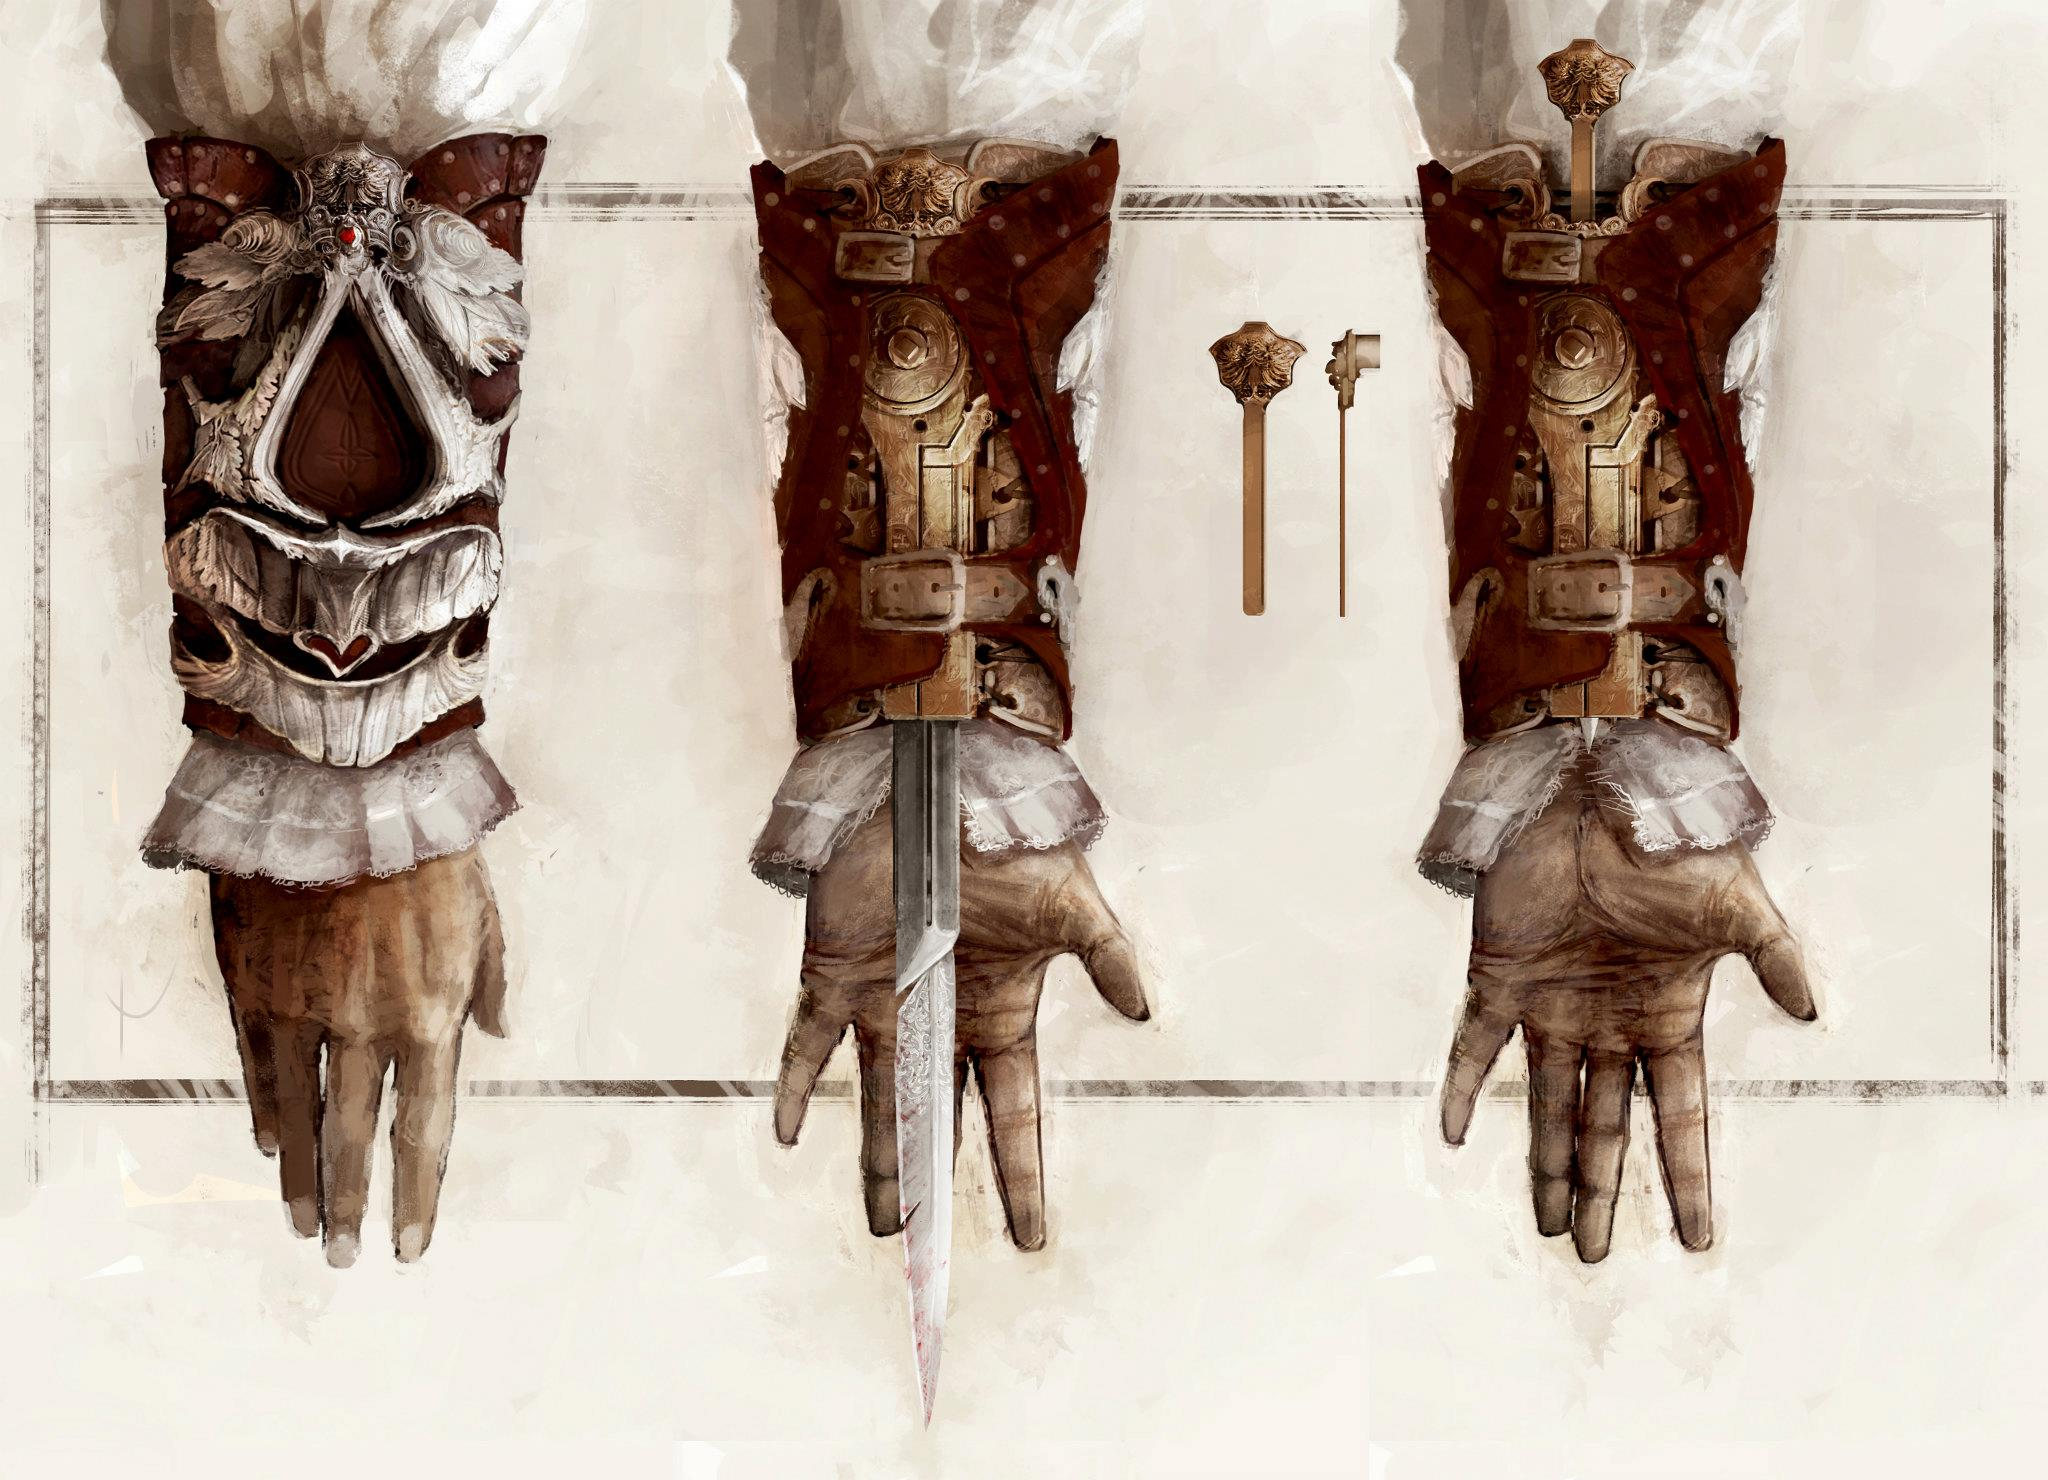 Dante Libraio Eerste-info-onthuld-over-assassin-s-creed-2_5_460x0